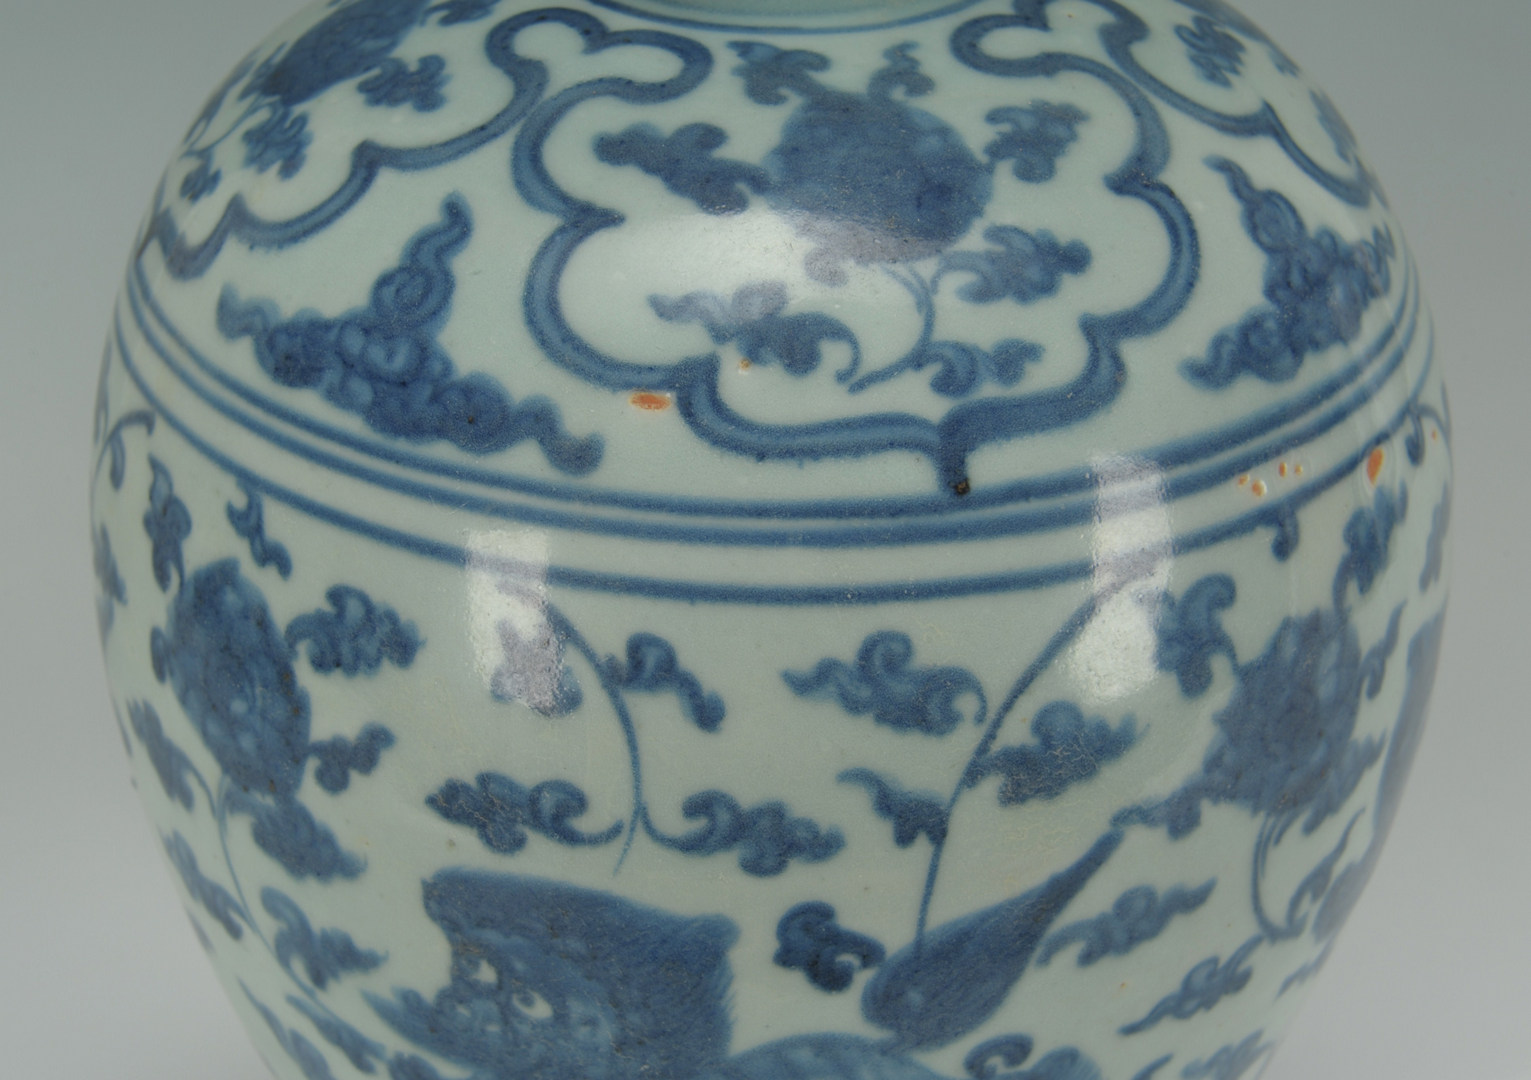 Lot 198: Chinese Porcelain Blue Underglaze Meiping Vase